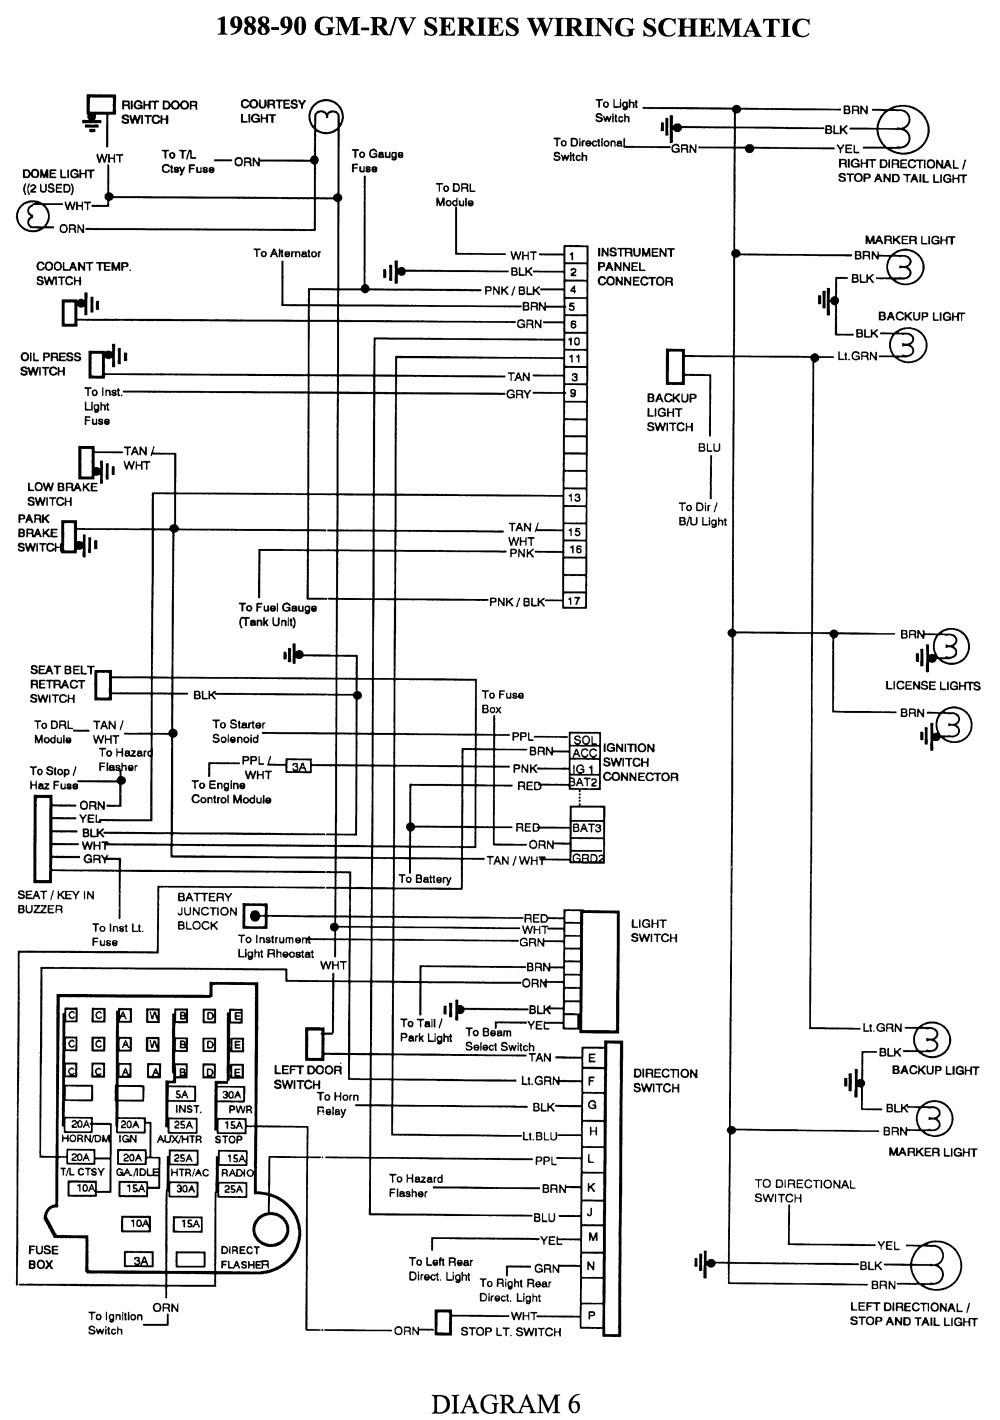 chevy trailblazer tail light diagram wiring diagram used trailblazer headlight wiring diagram chevy trailblazer tail light